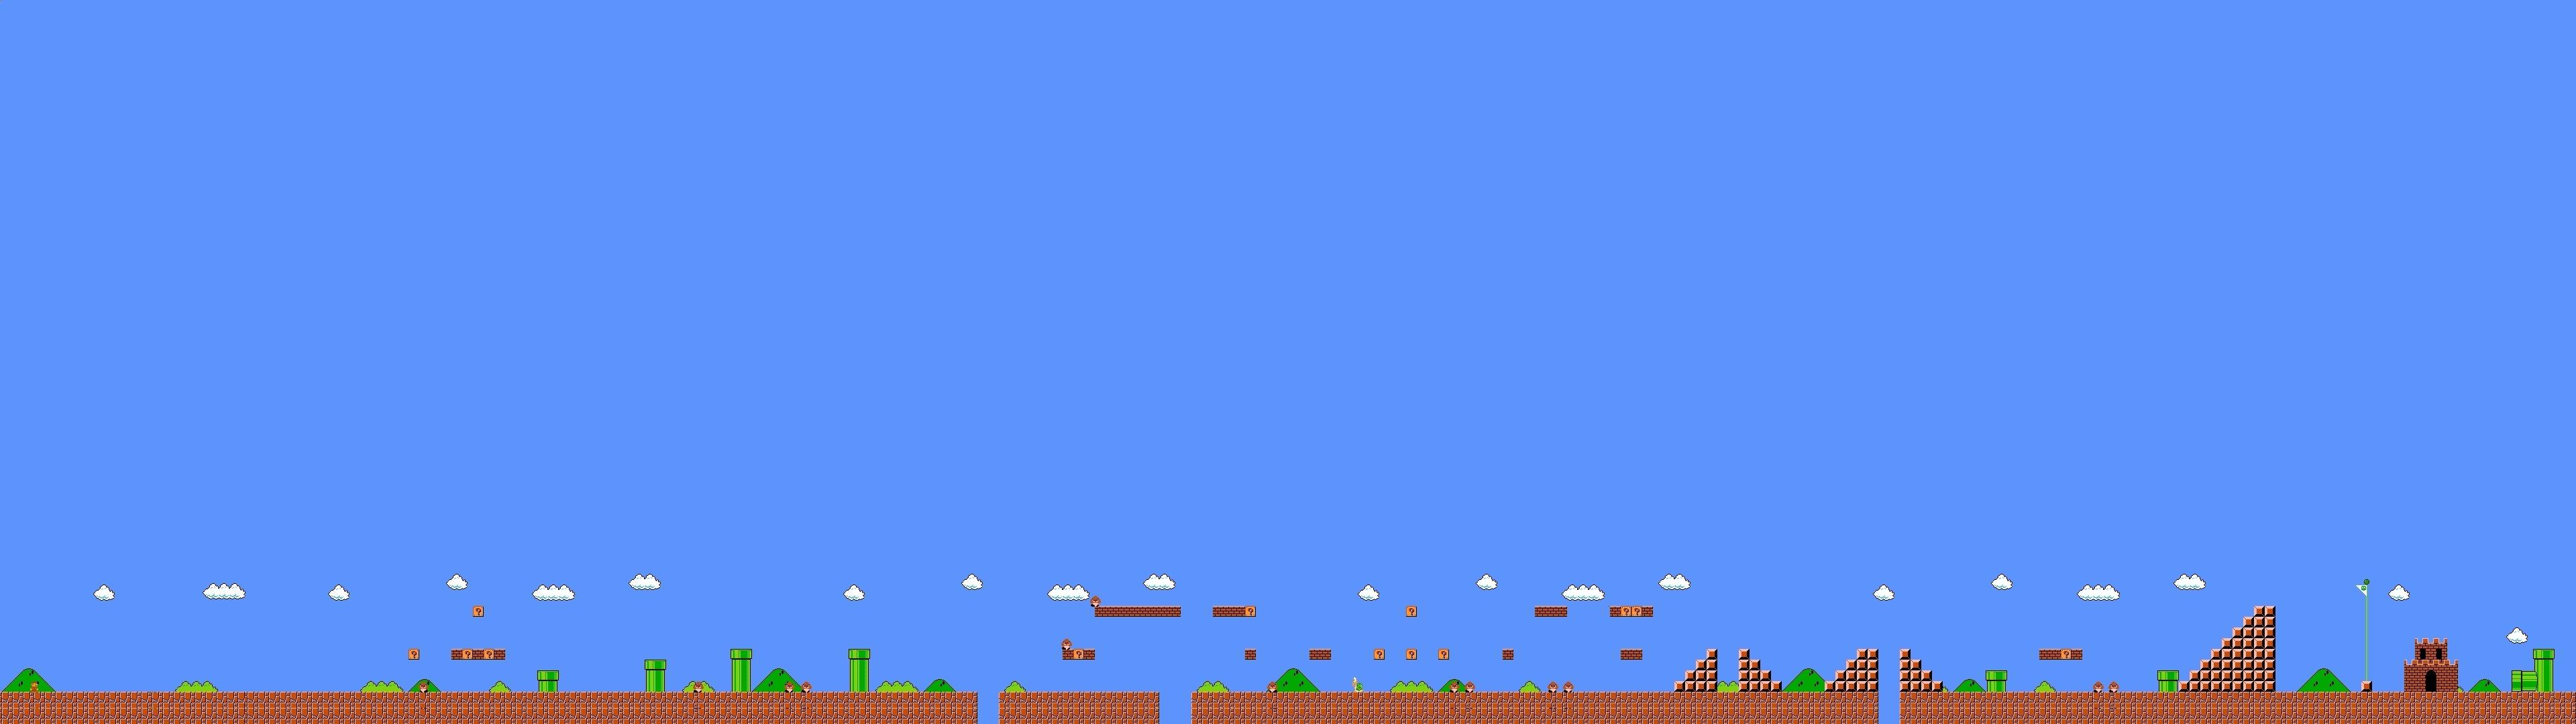 Screen Multi Multiple Videogame Game Jeu Video Mario Bross Wallpaper 3840x1080